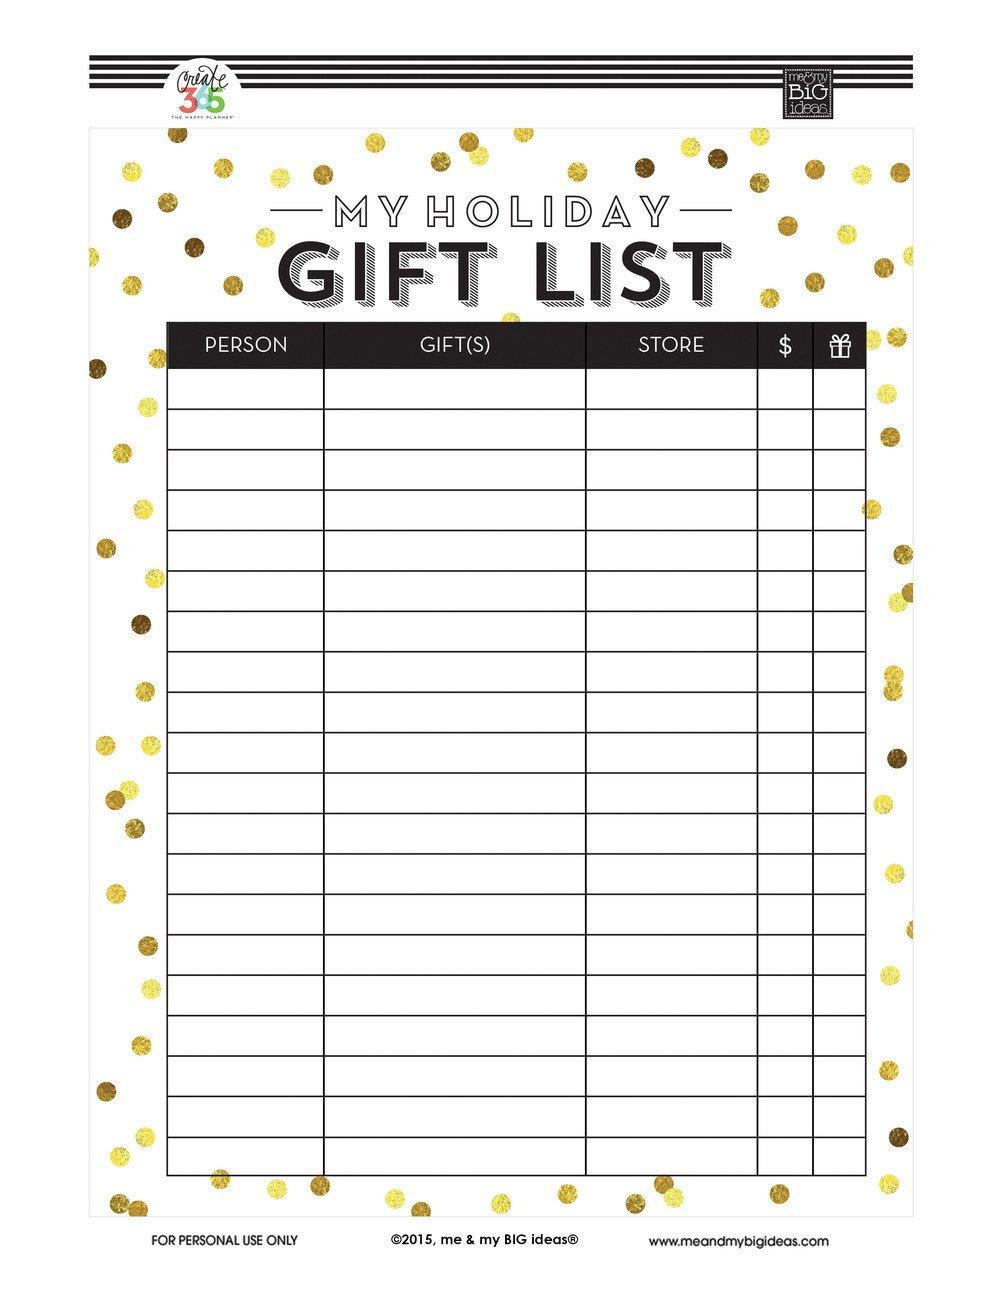 Christmas Gift List Template Holiday Gift List Free Printables — Me & My Big Ideas